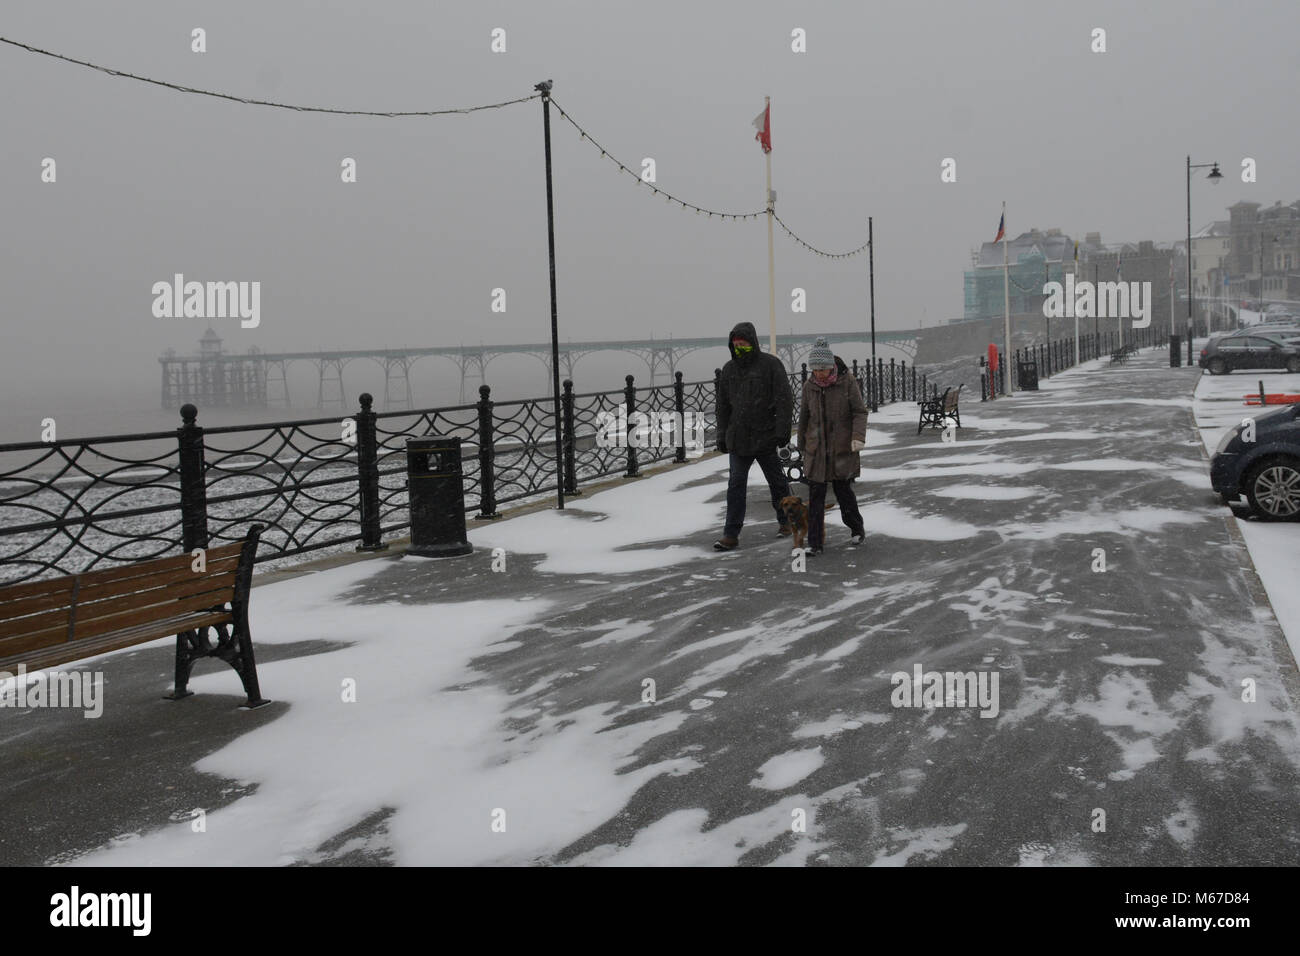 Clevedon Sea Front  1st Mar, 2018  UK Weather: UK Weather